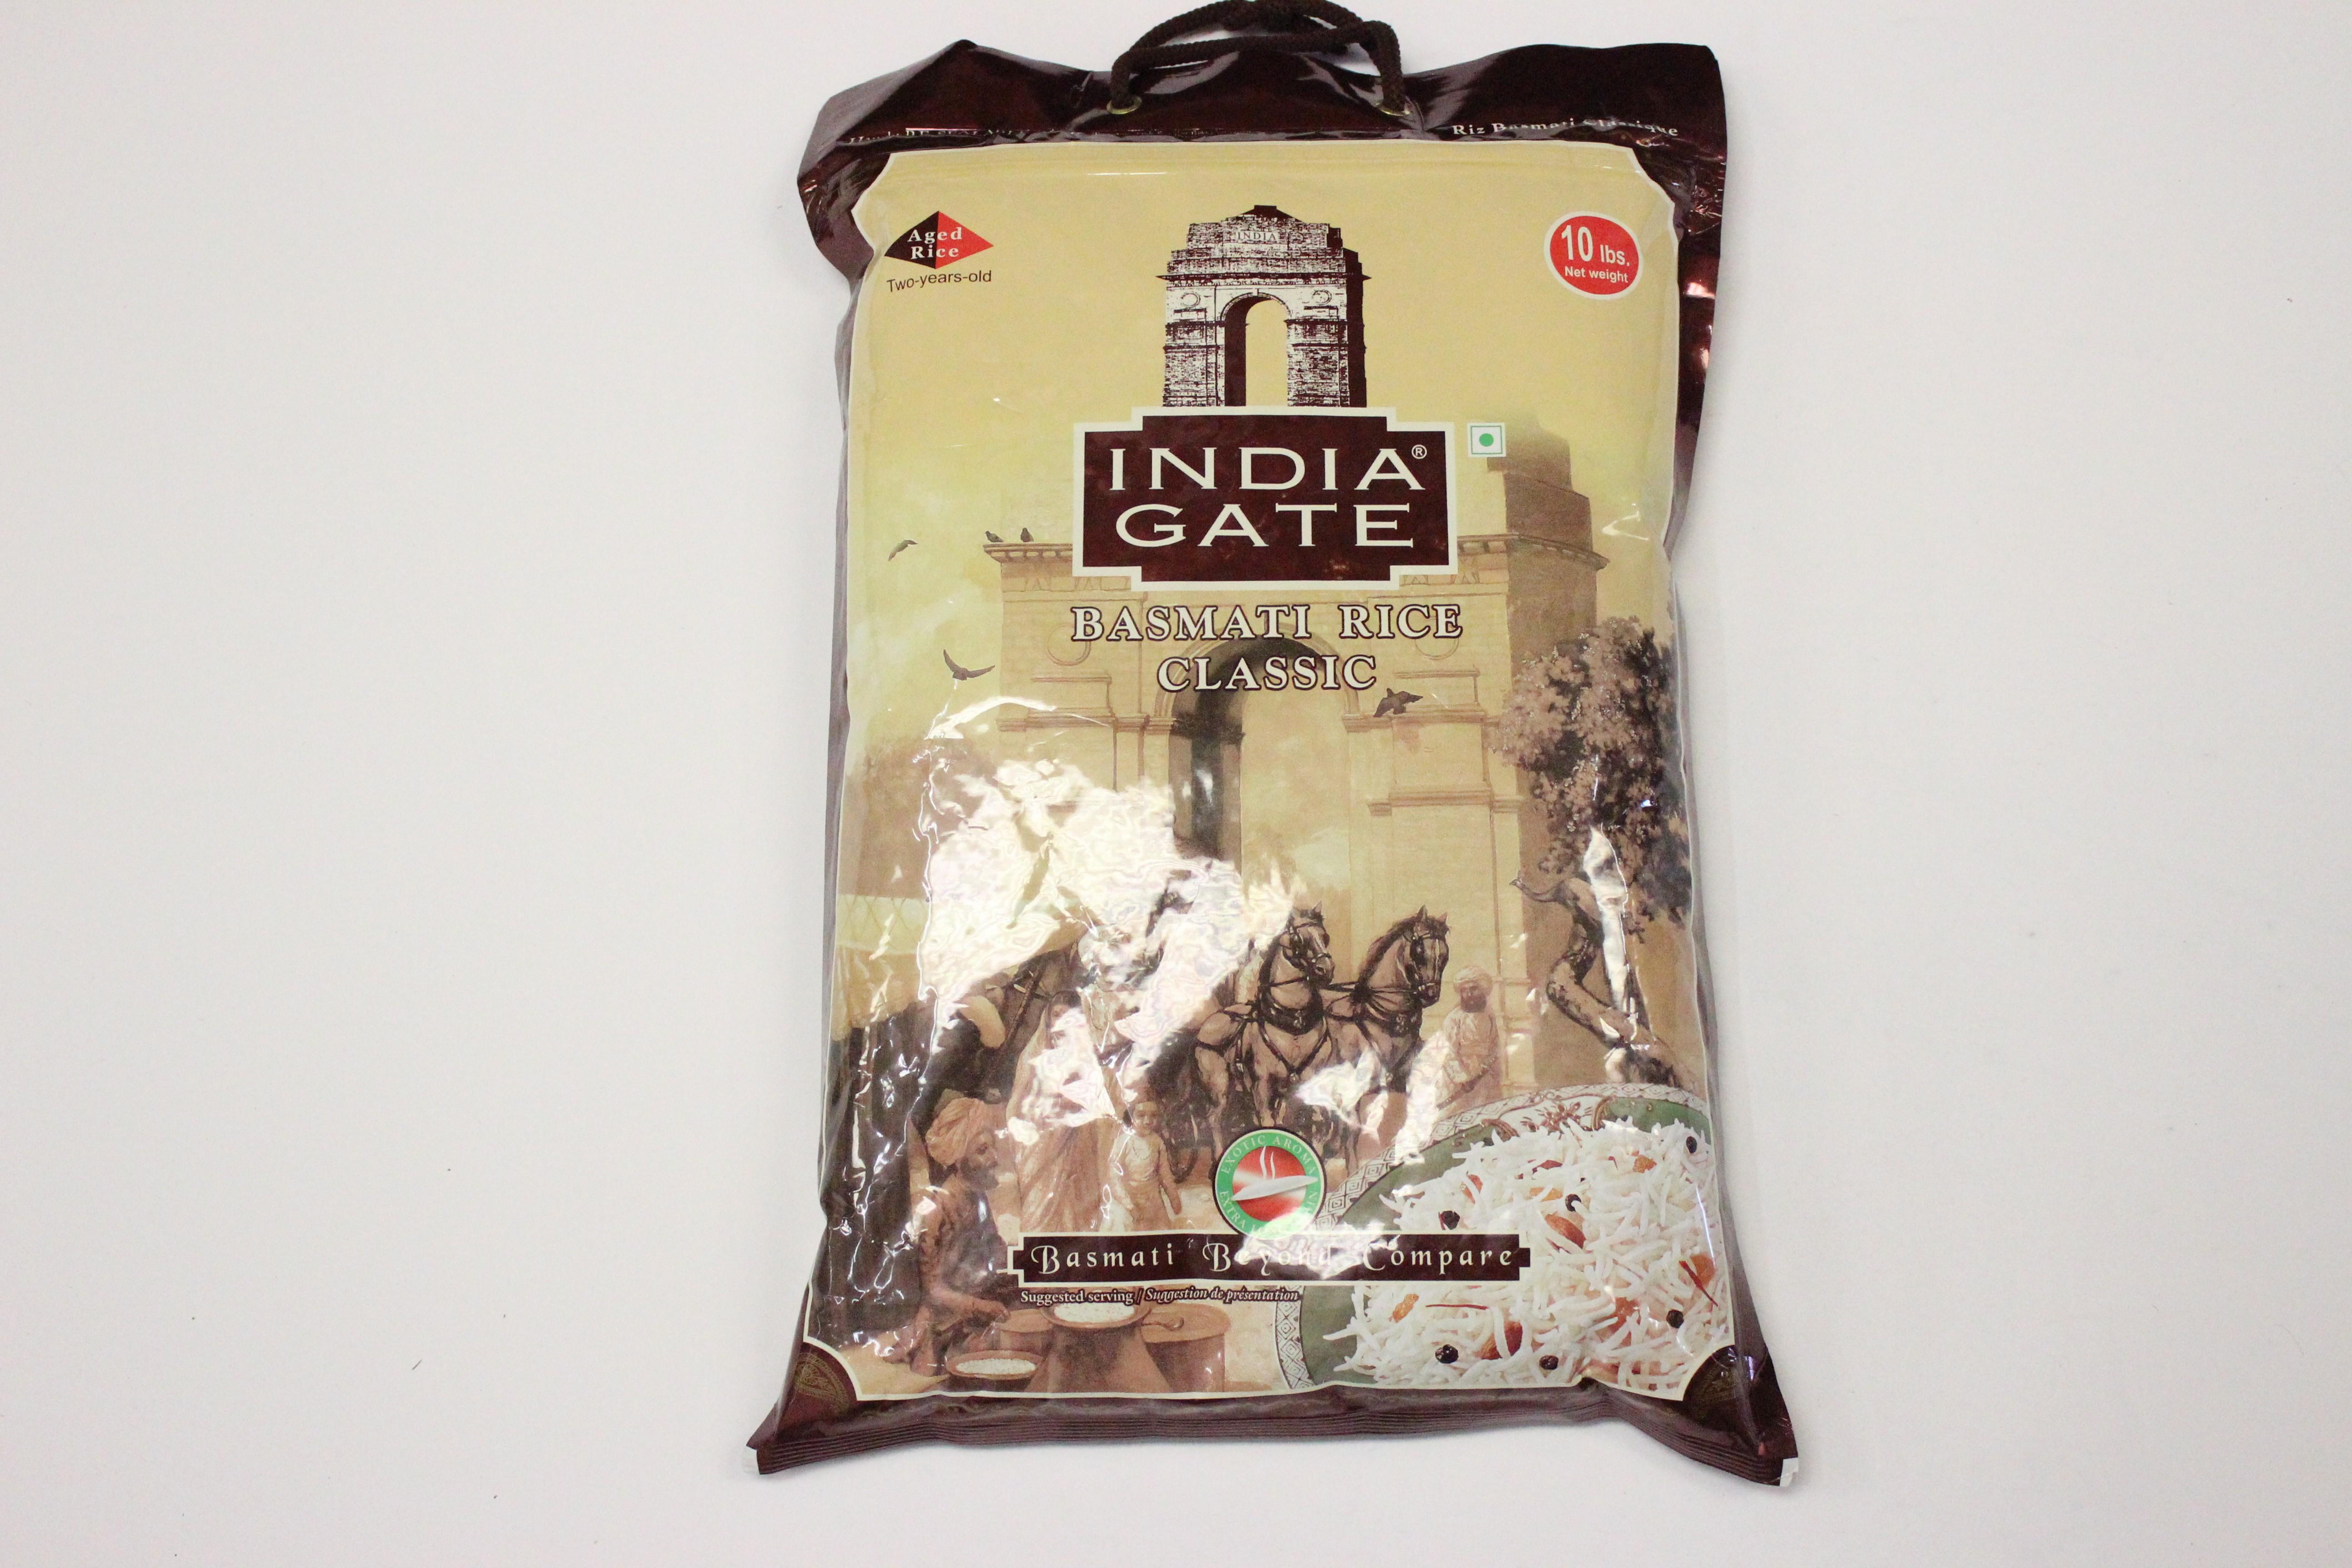 India Gate Classic Basmati Rice 10lb